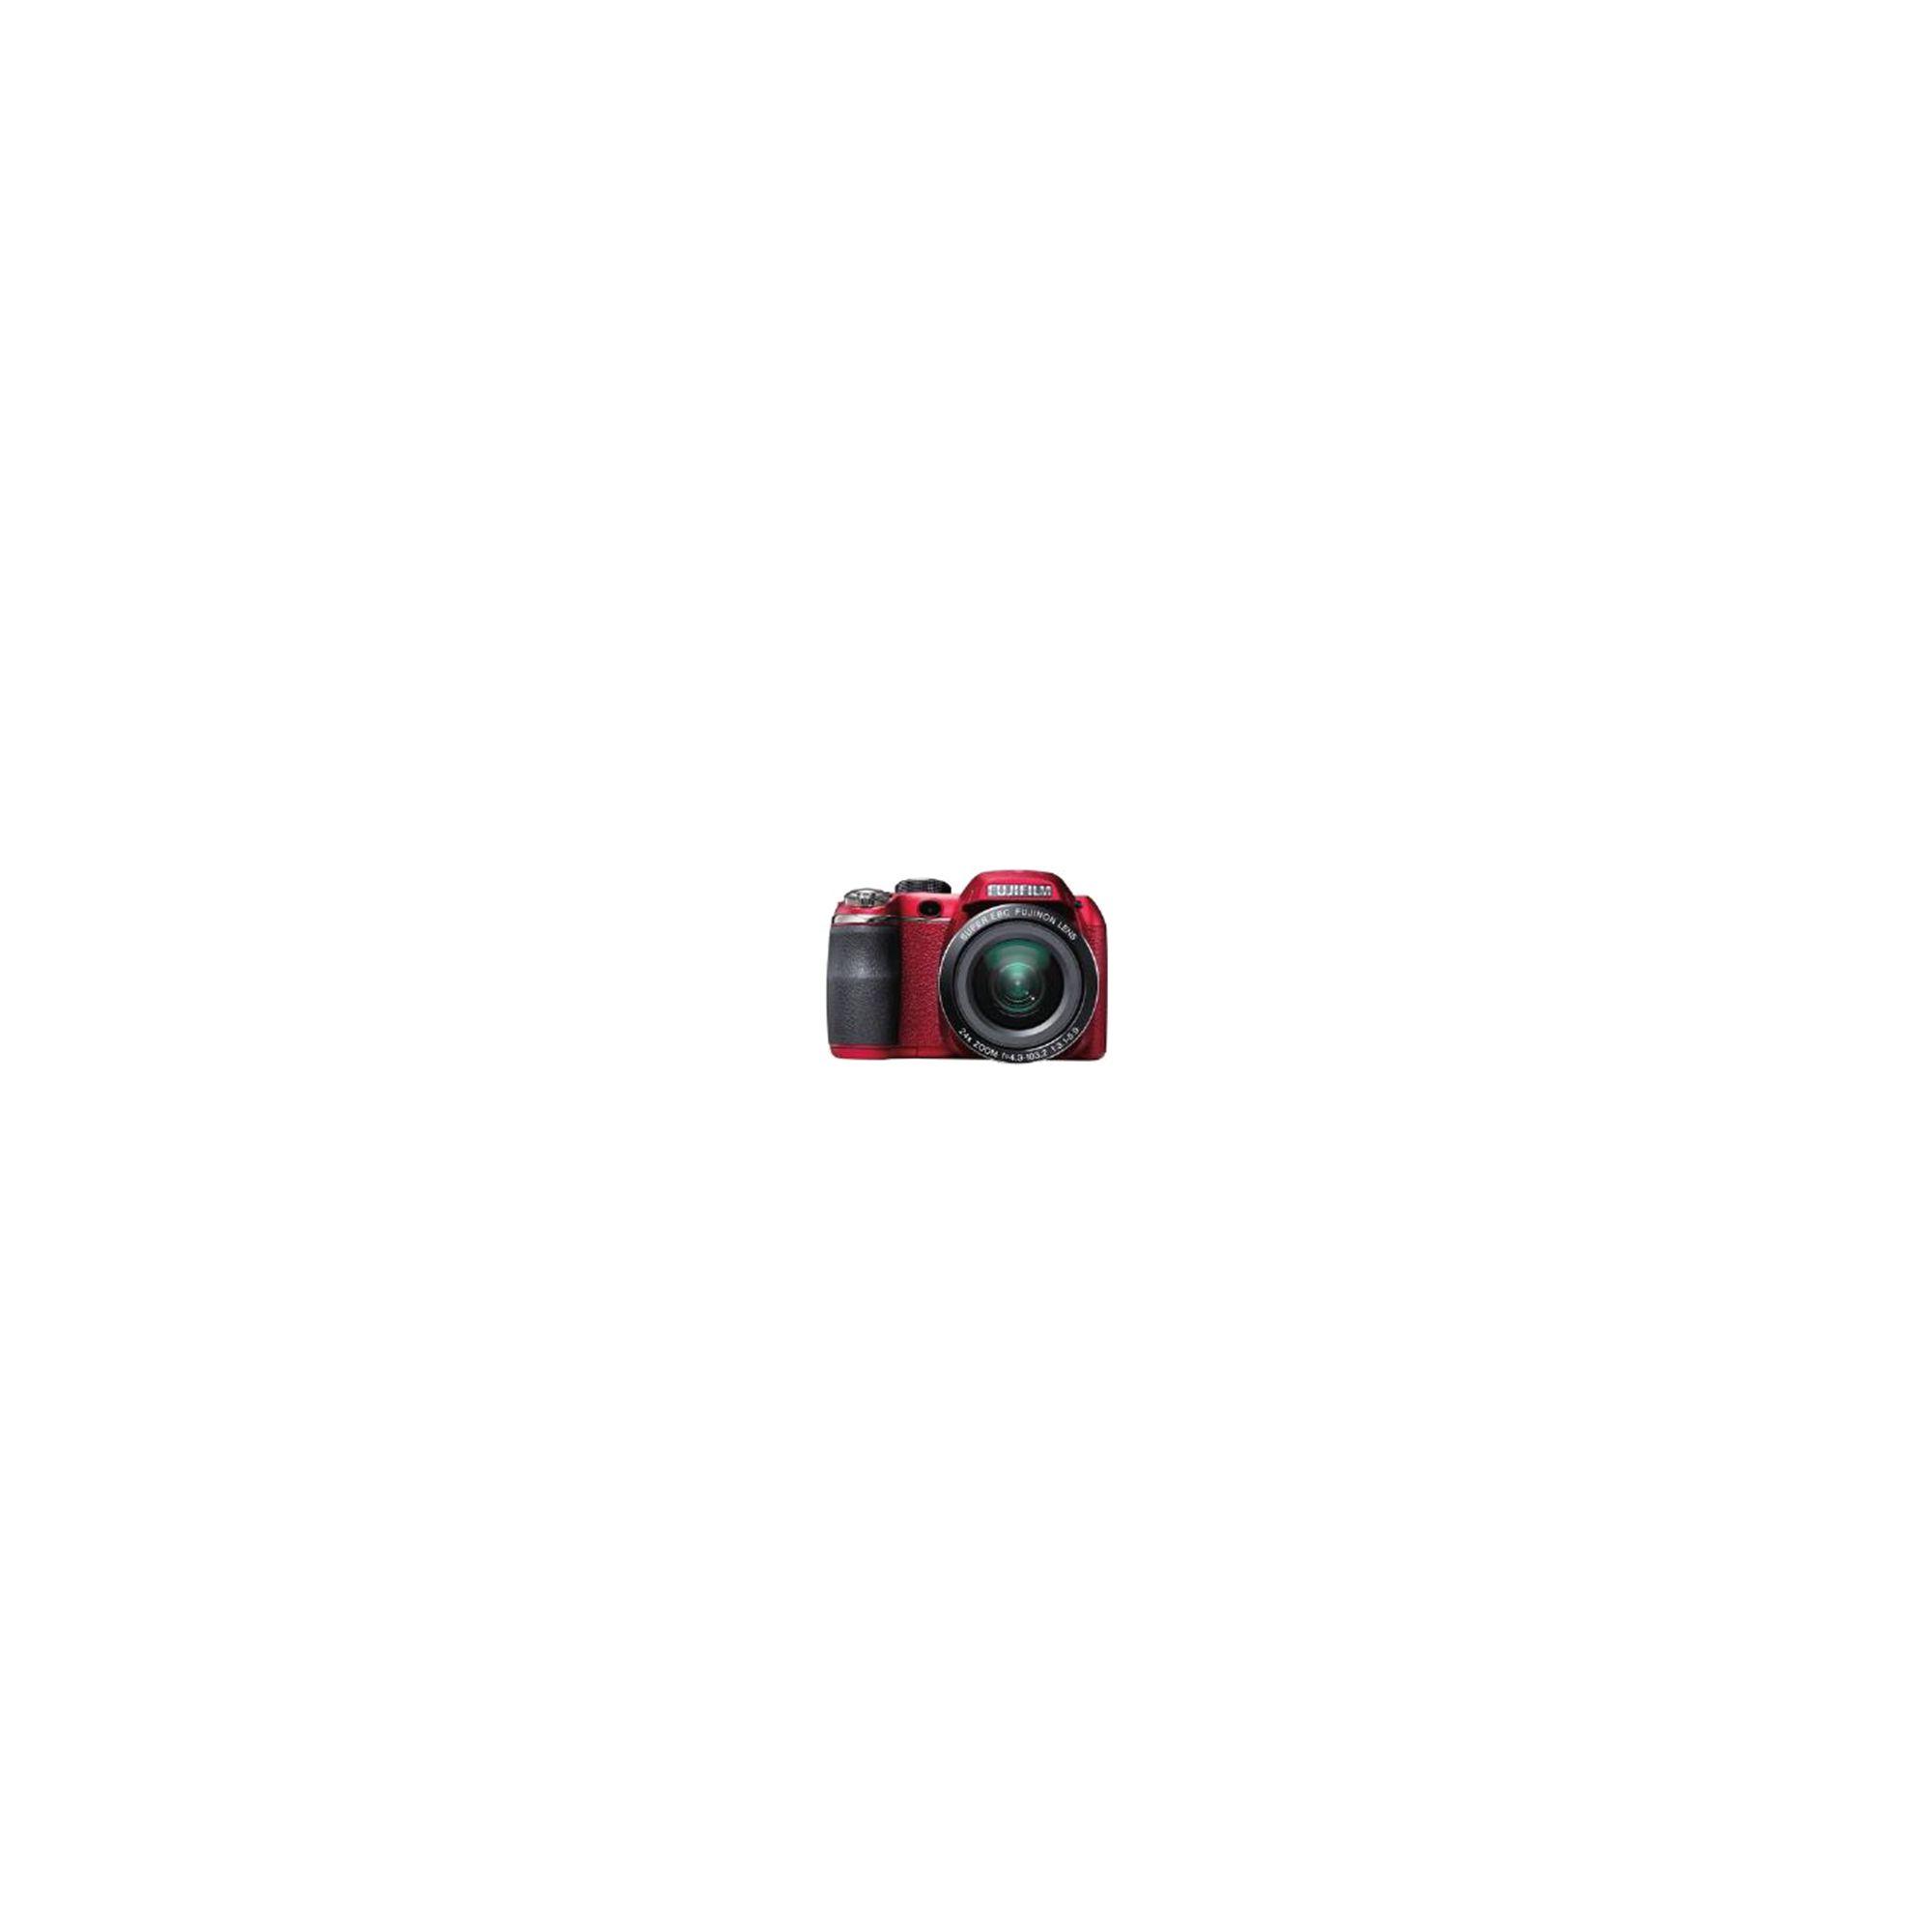 Fujifilm FinePix S4200 Digital Camera, Red, 14MP, 24x Optical Zoom, 3.0 inch LCD Screen